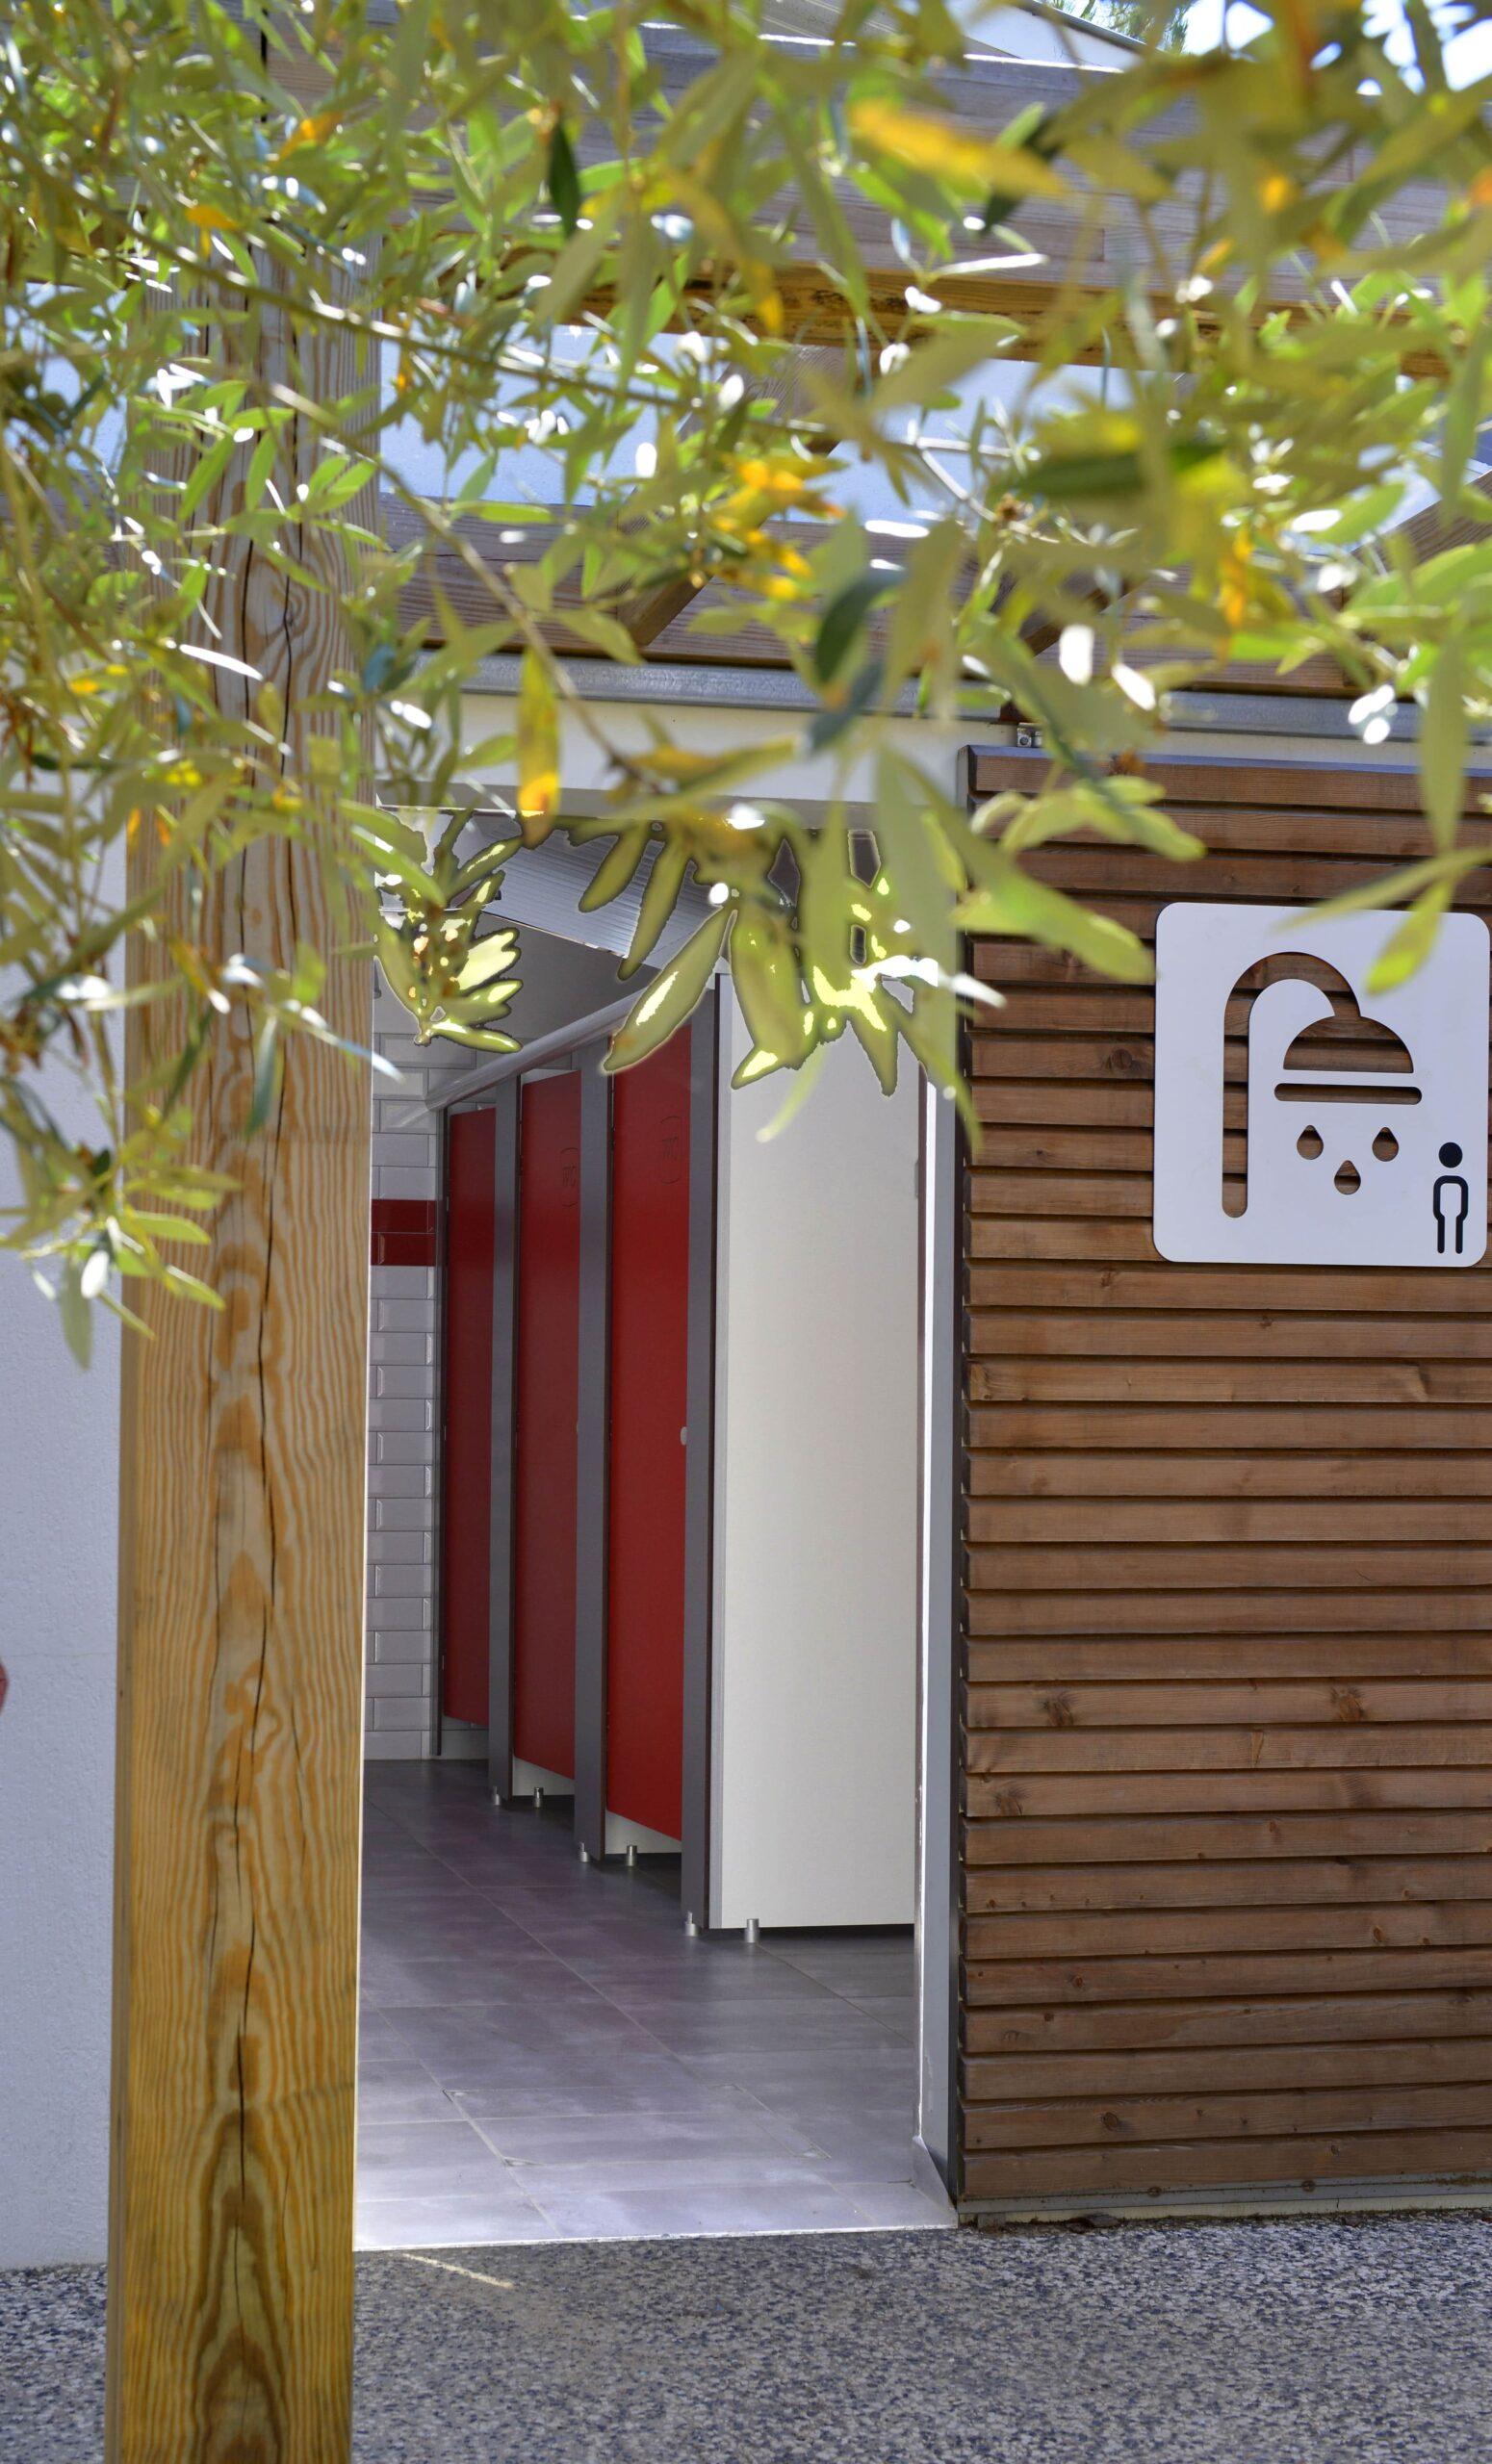 Sanitary-camping-comfort-saint-jean-de-mont-le-tropicana